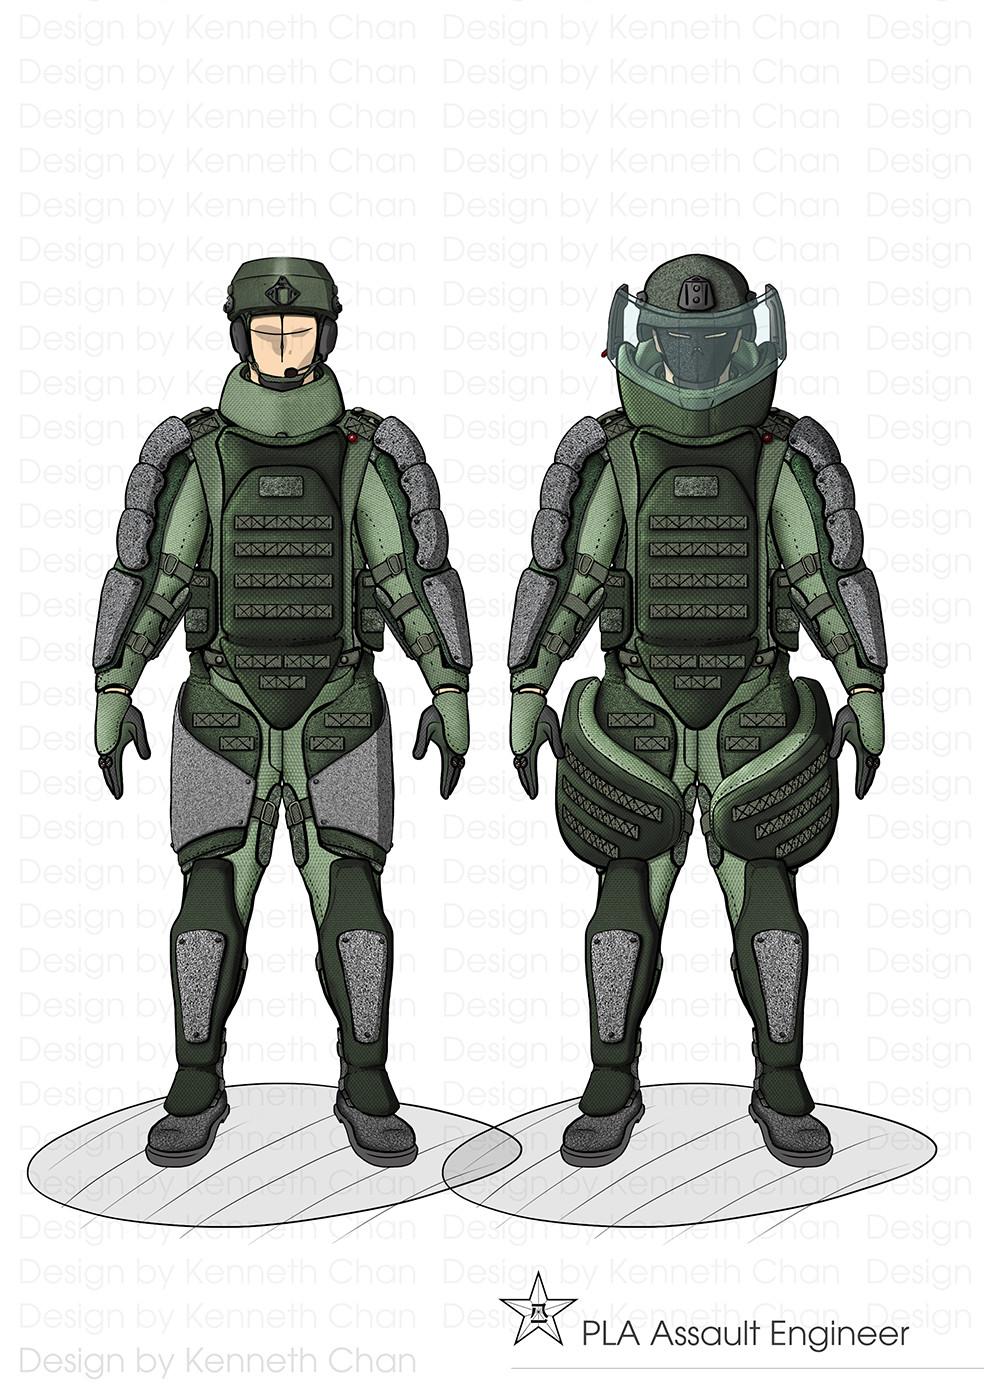 PLA Assault Engineers EOD Gear  (Left) Standard Version Gear (Right)Full Armor Version Gear(Heavy Assault Shield Soldiers)